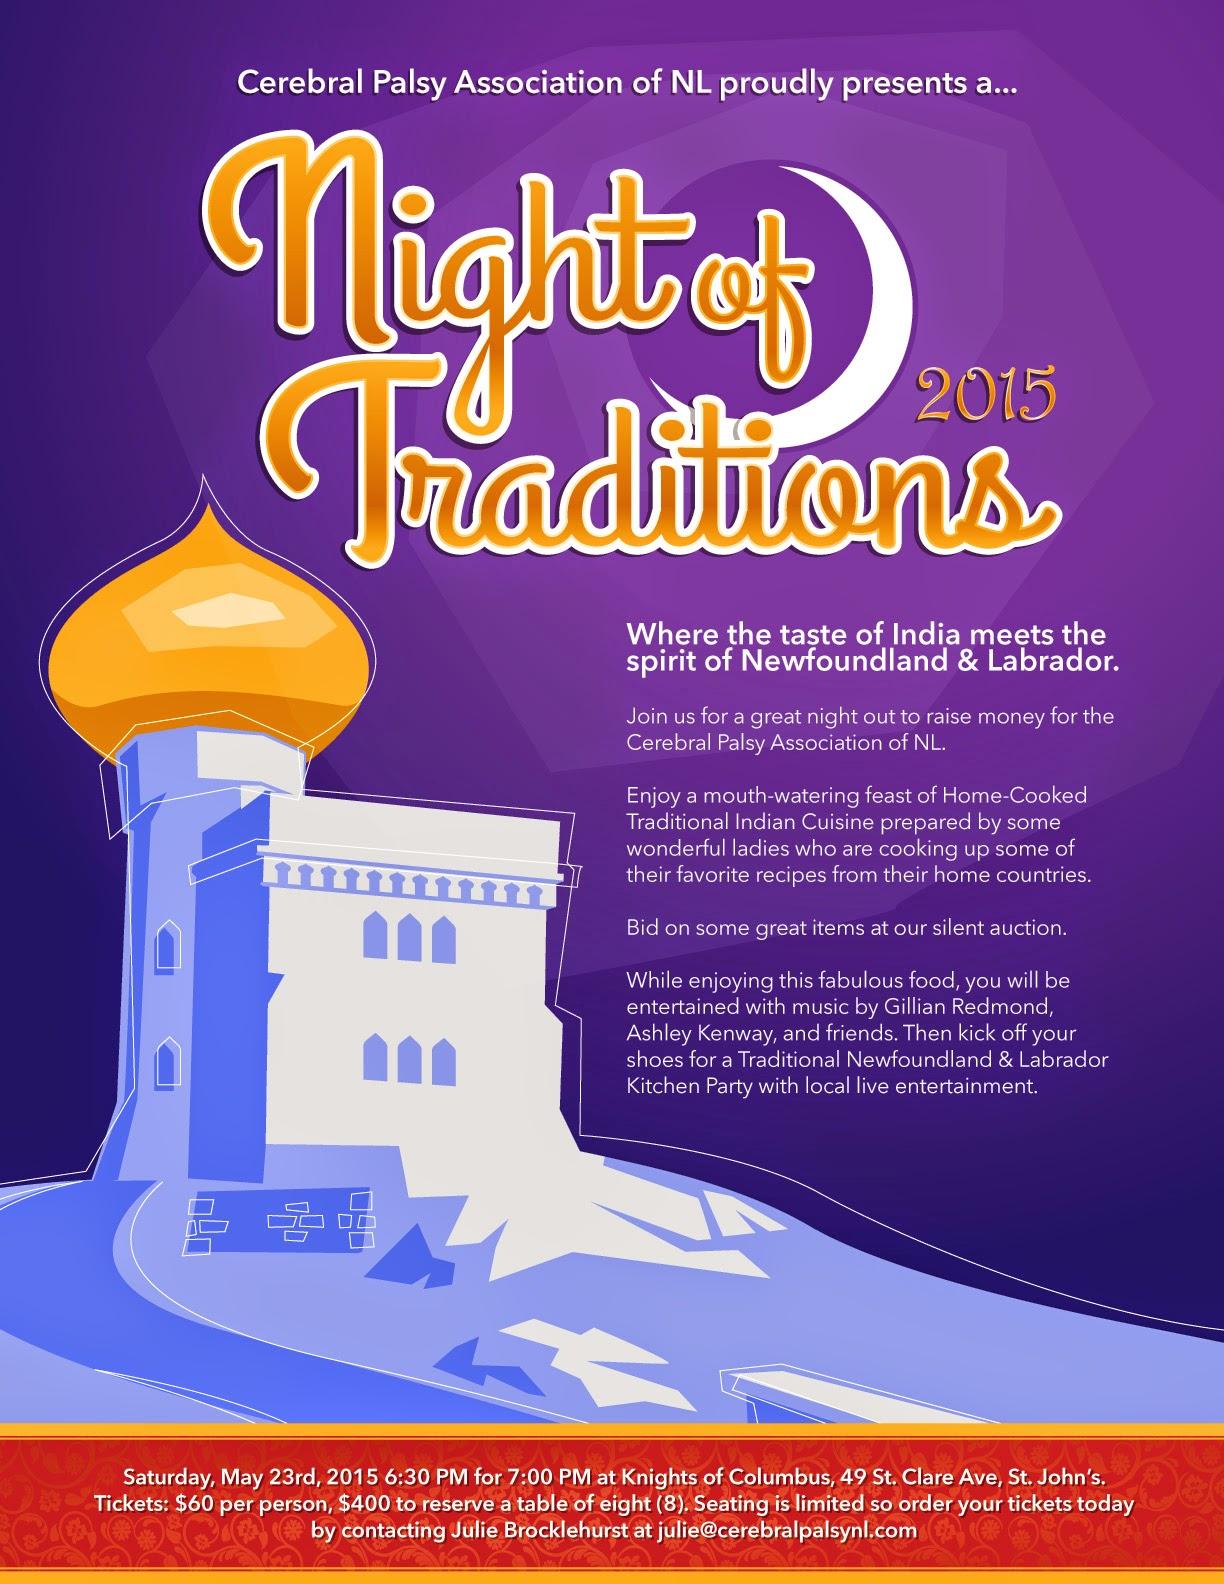 http://cerebralpalsynl.com/event/night-of-traditions-2/